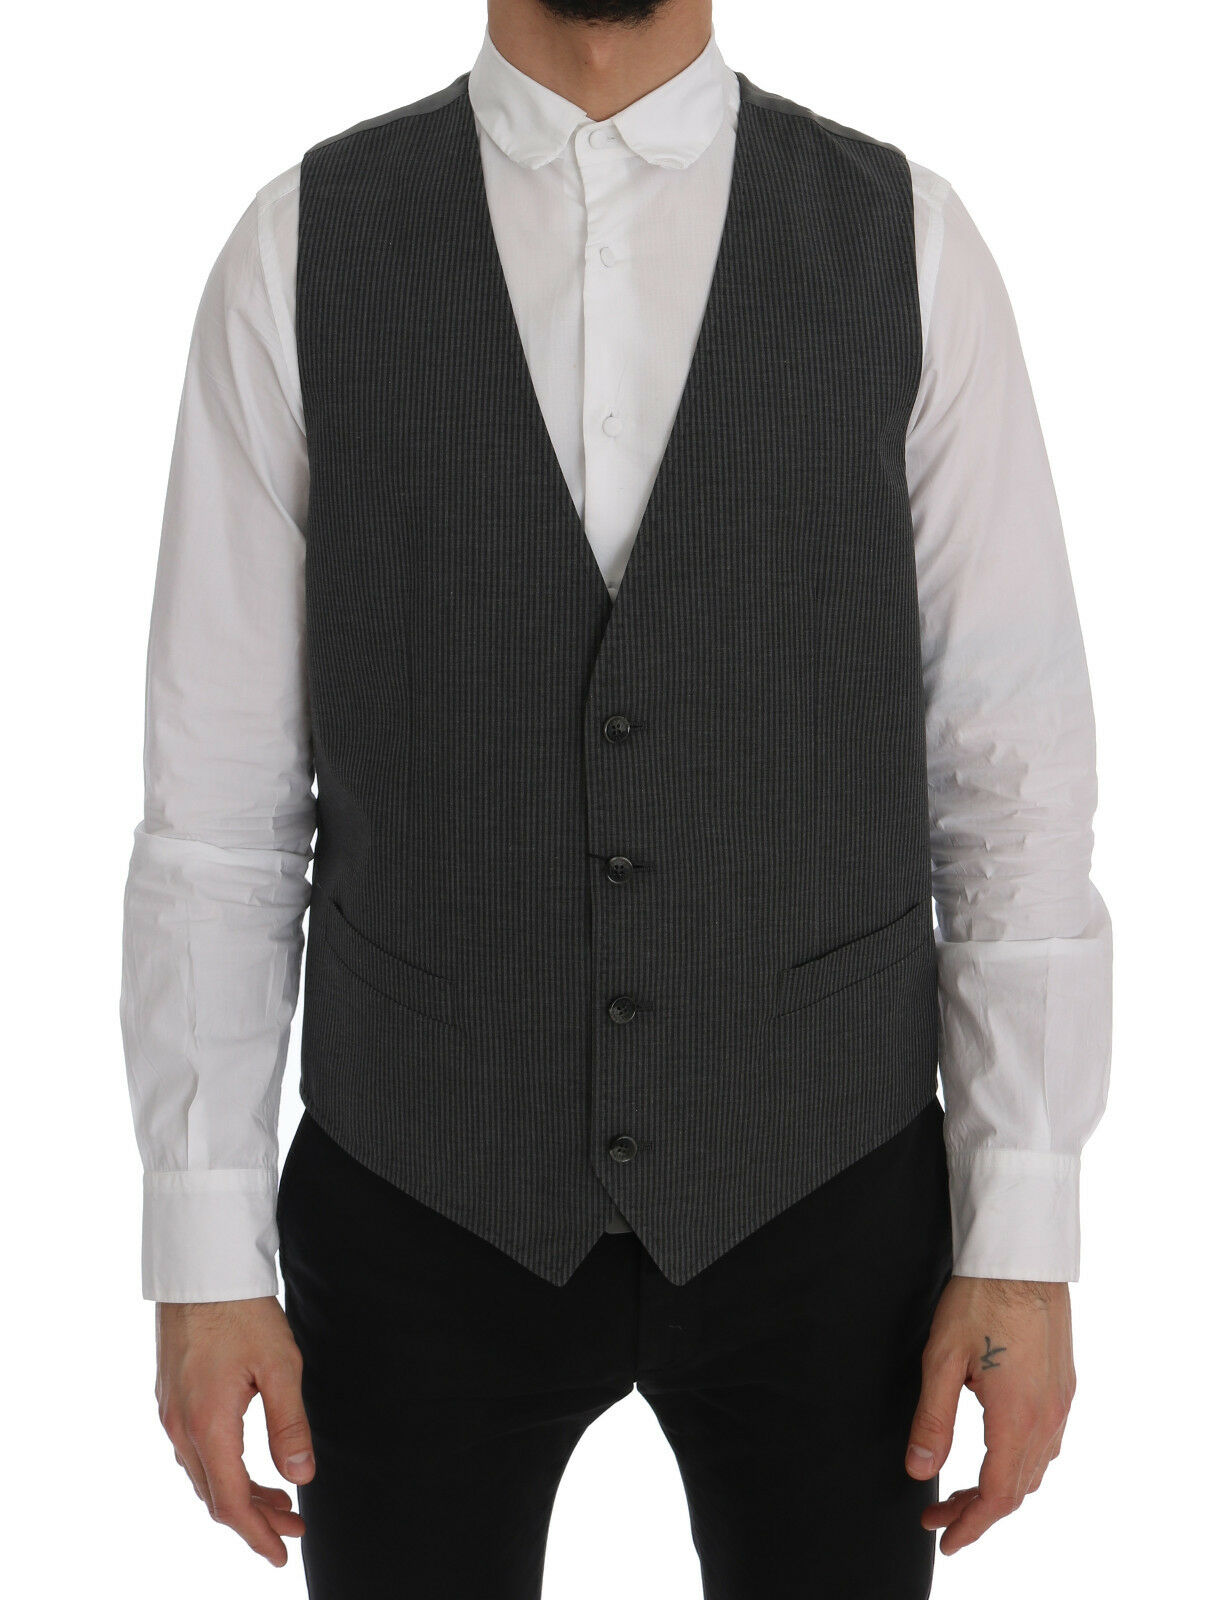 NEW DOLCE & GABBANA STAFF Vest Waistcoat grau Cotton Rayon IT56 / US46 /2XL